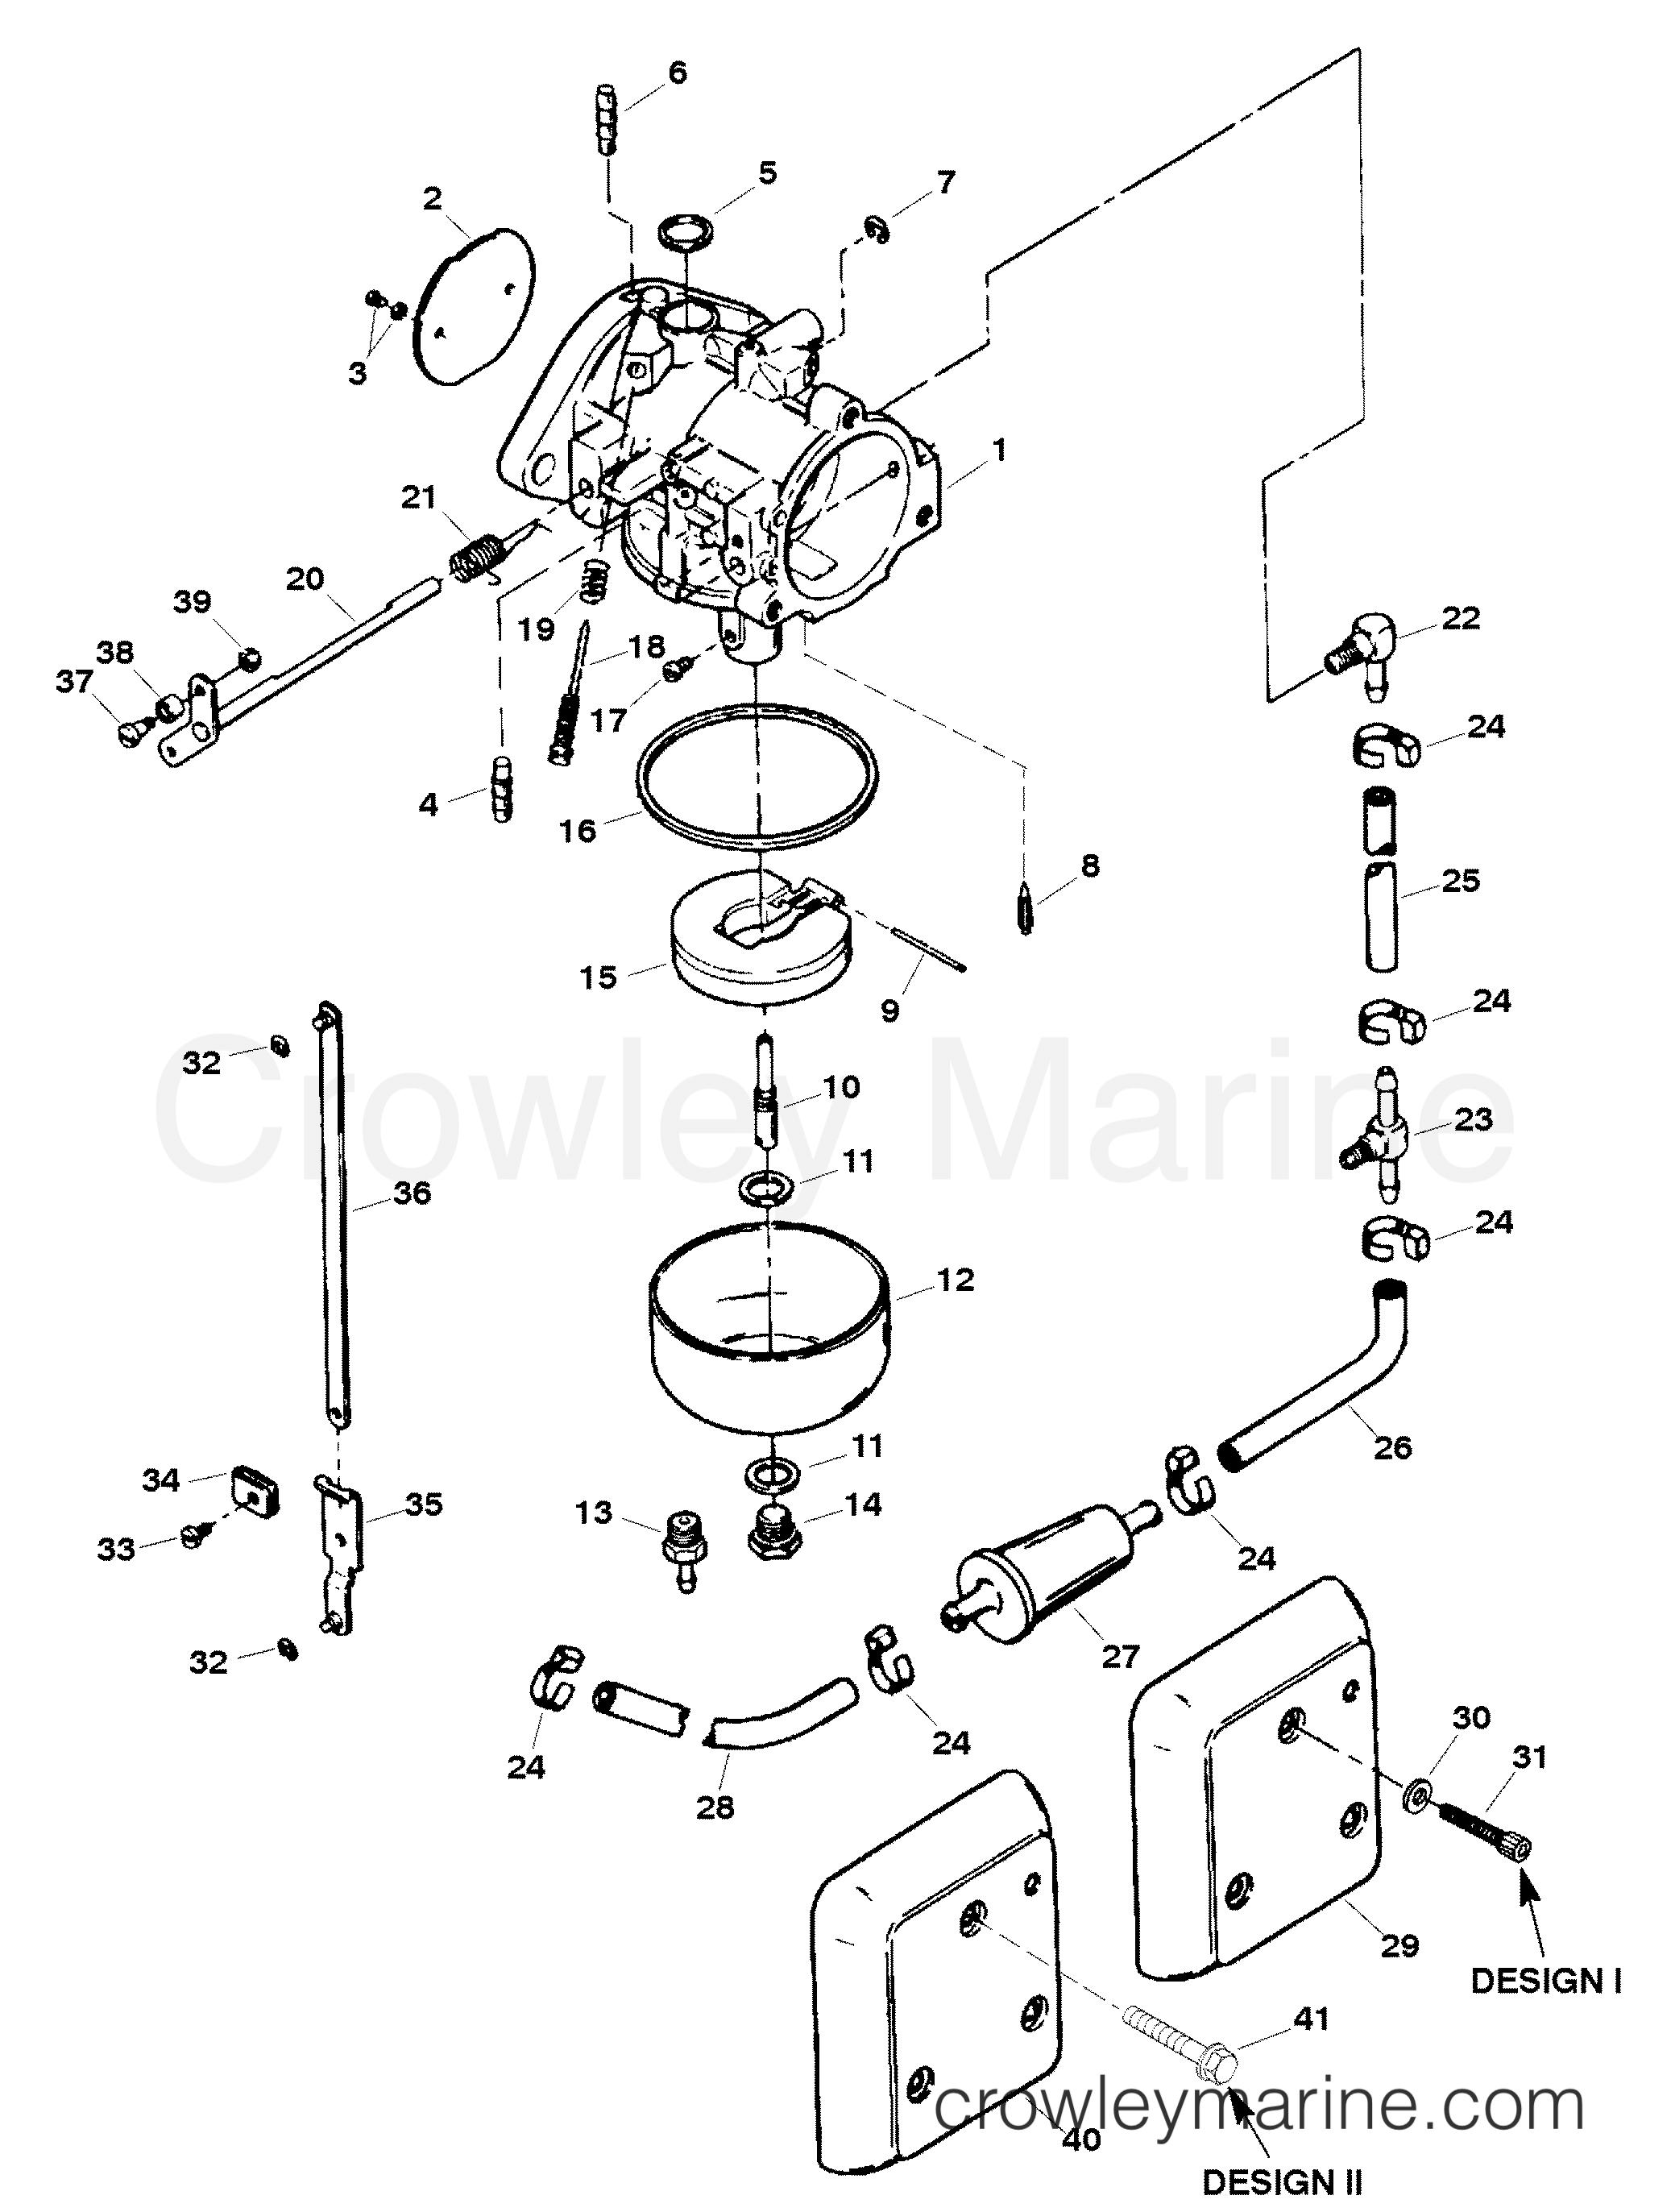 John Deere Carburetor Diagram Detailed Schematic Diagrams L120 Wiring Force Outboard Wire Data Schema U2022 Snowblower